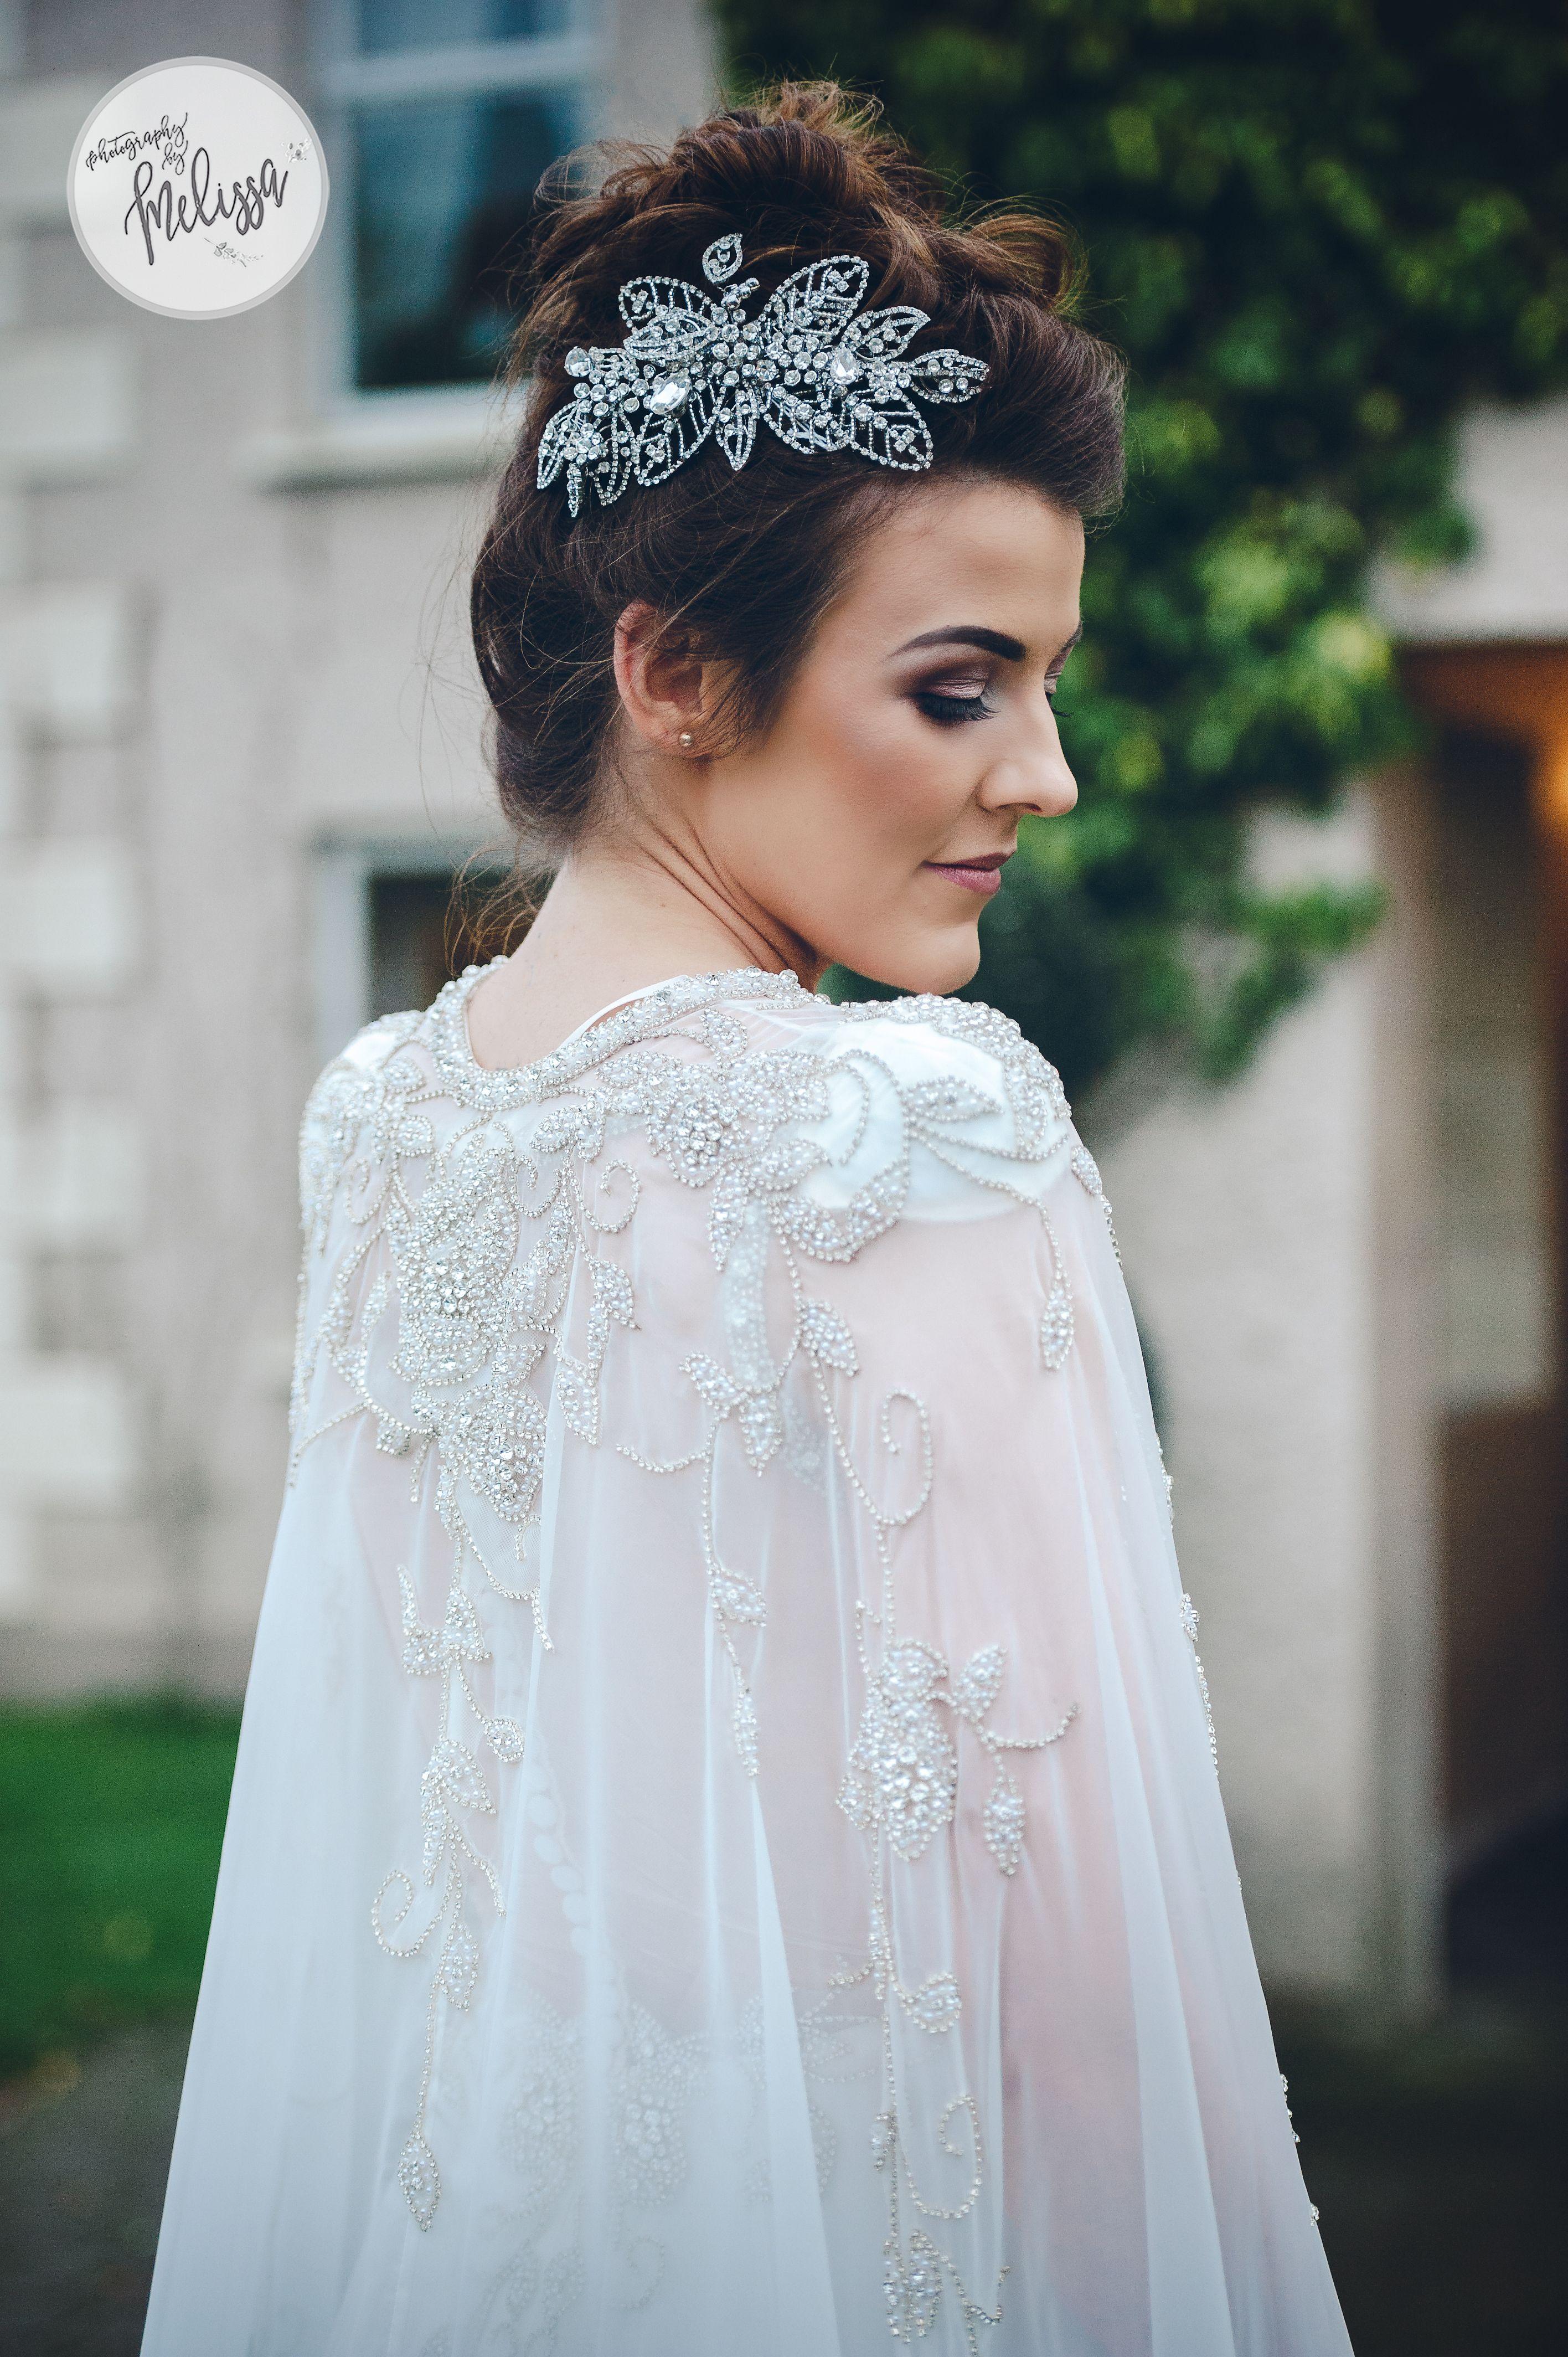 Tullylagan house hotel bridal shoot with creative ideas bridal